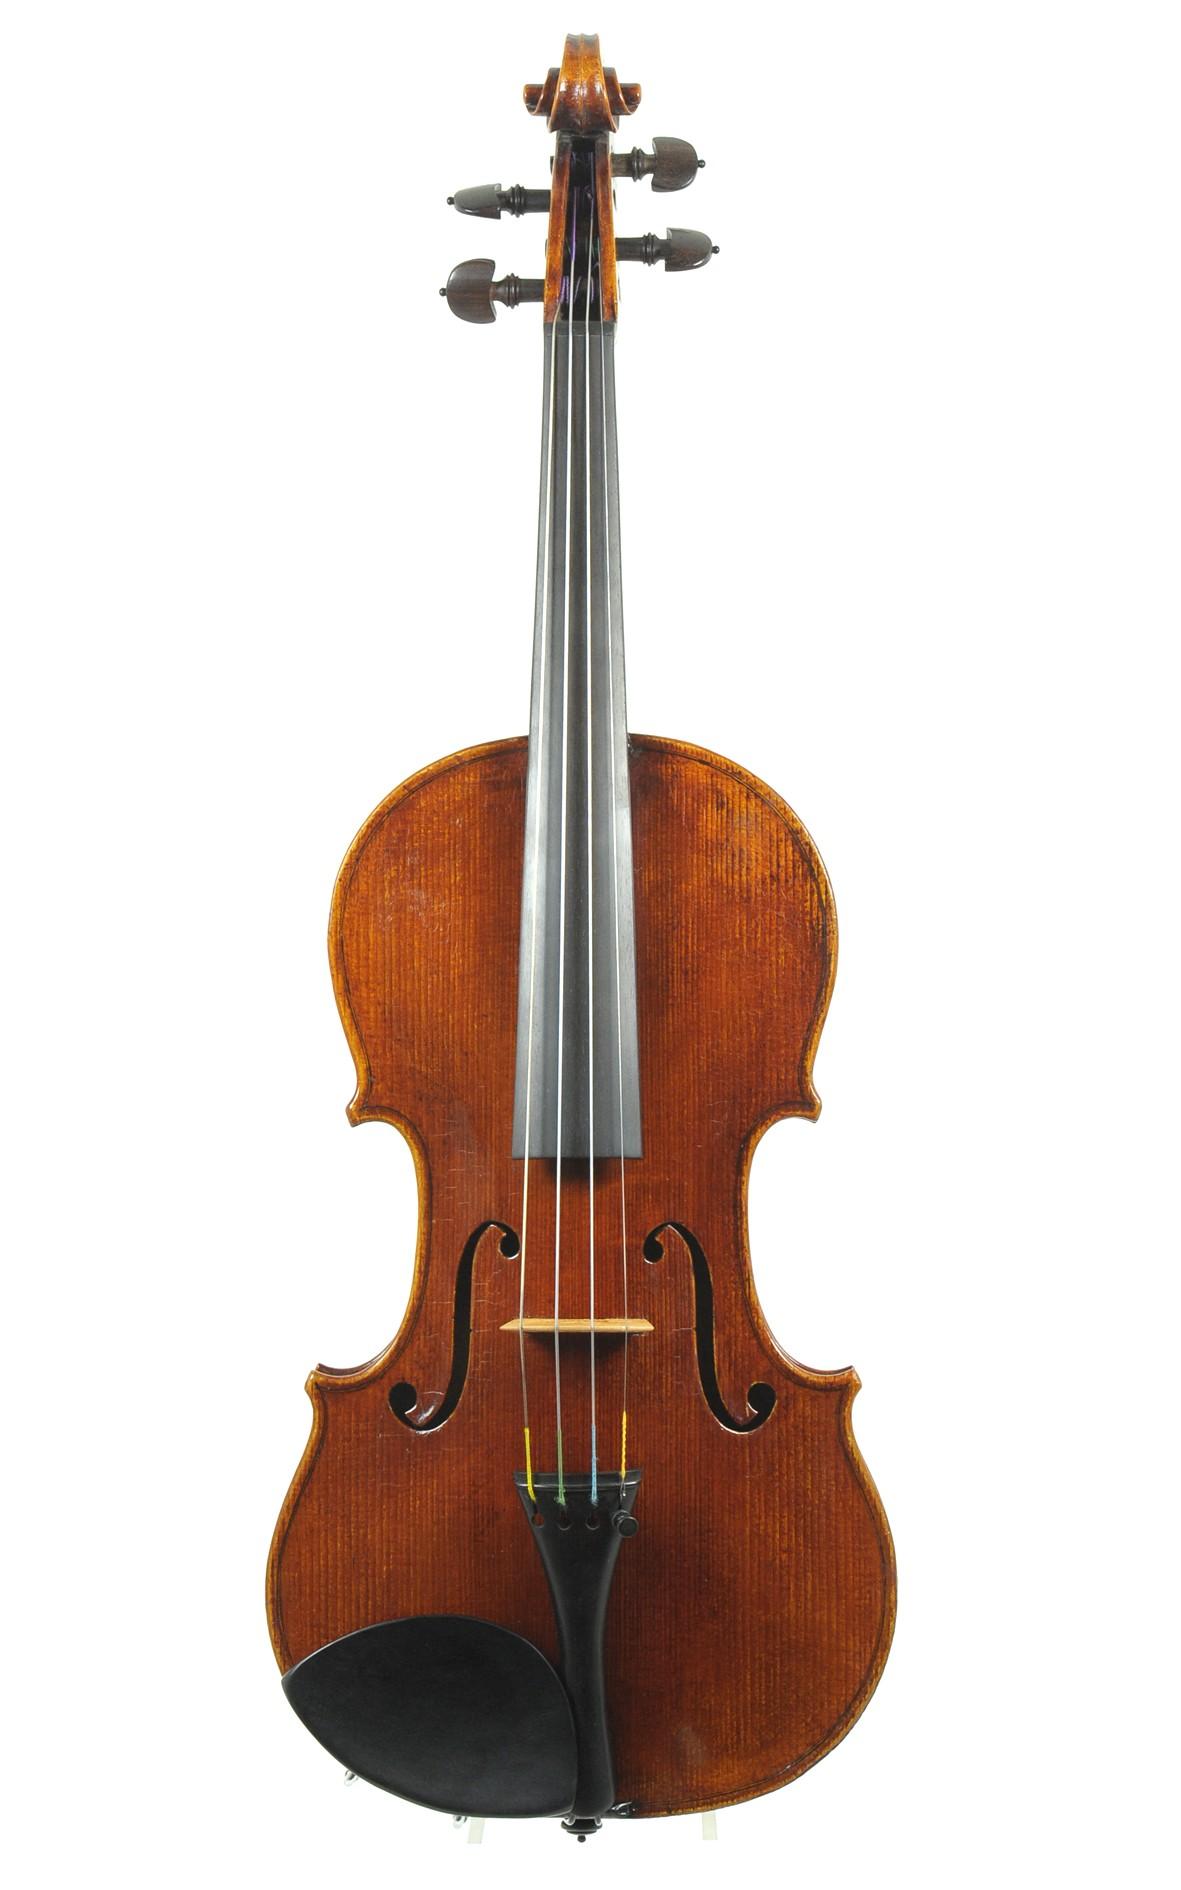 Contemporary master violin, Jean Strick, Bruxelles 1999